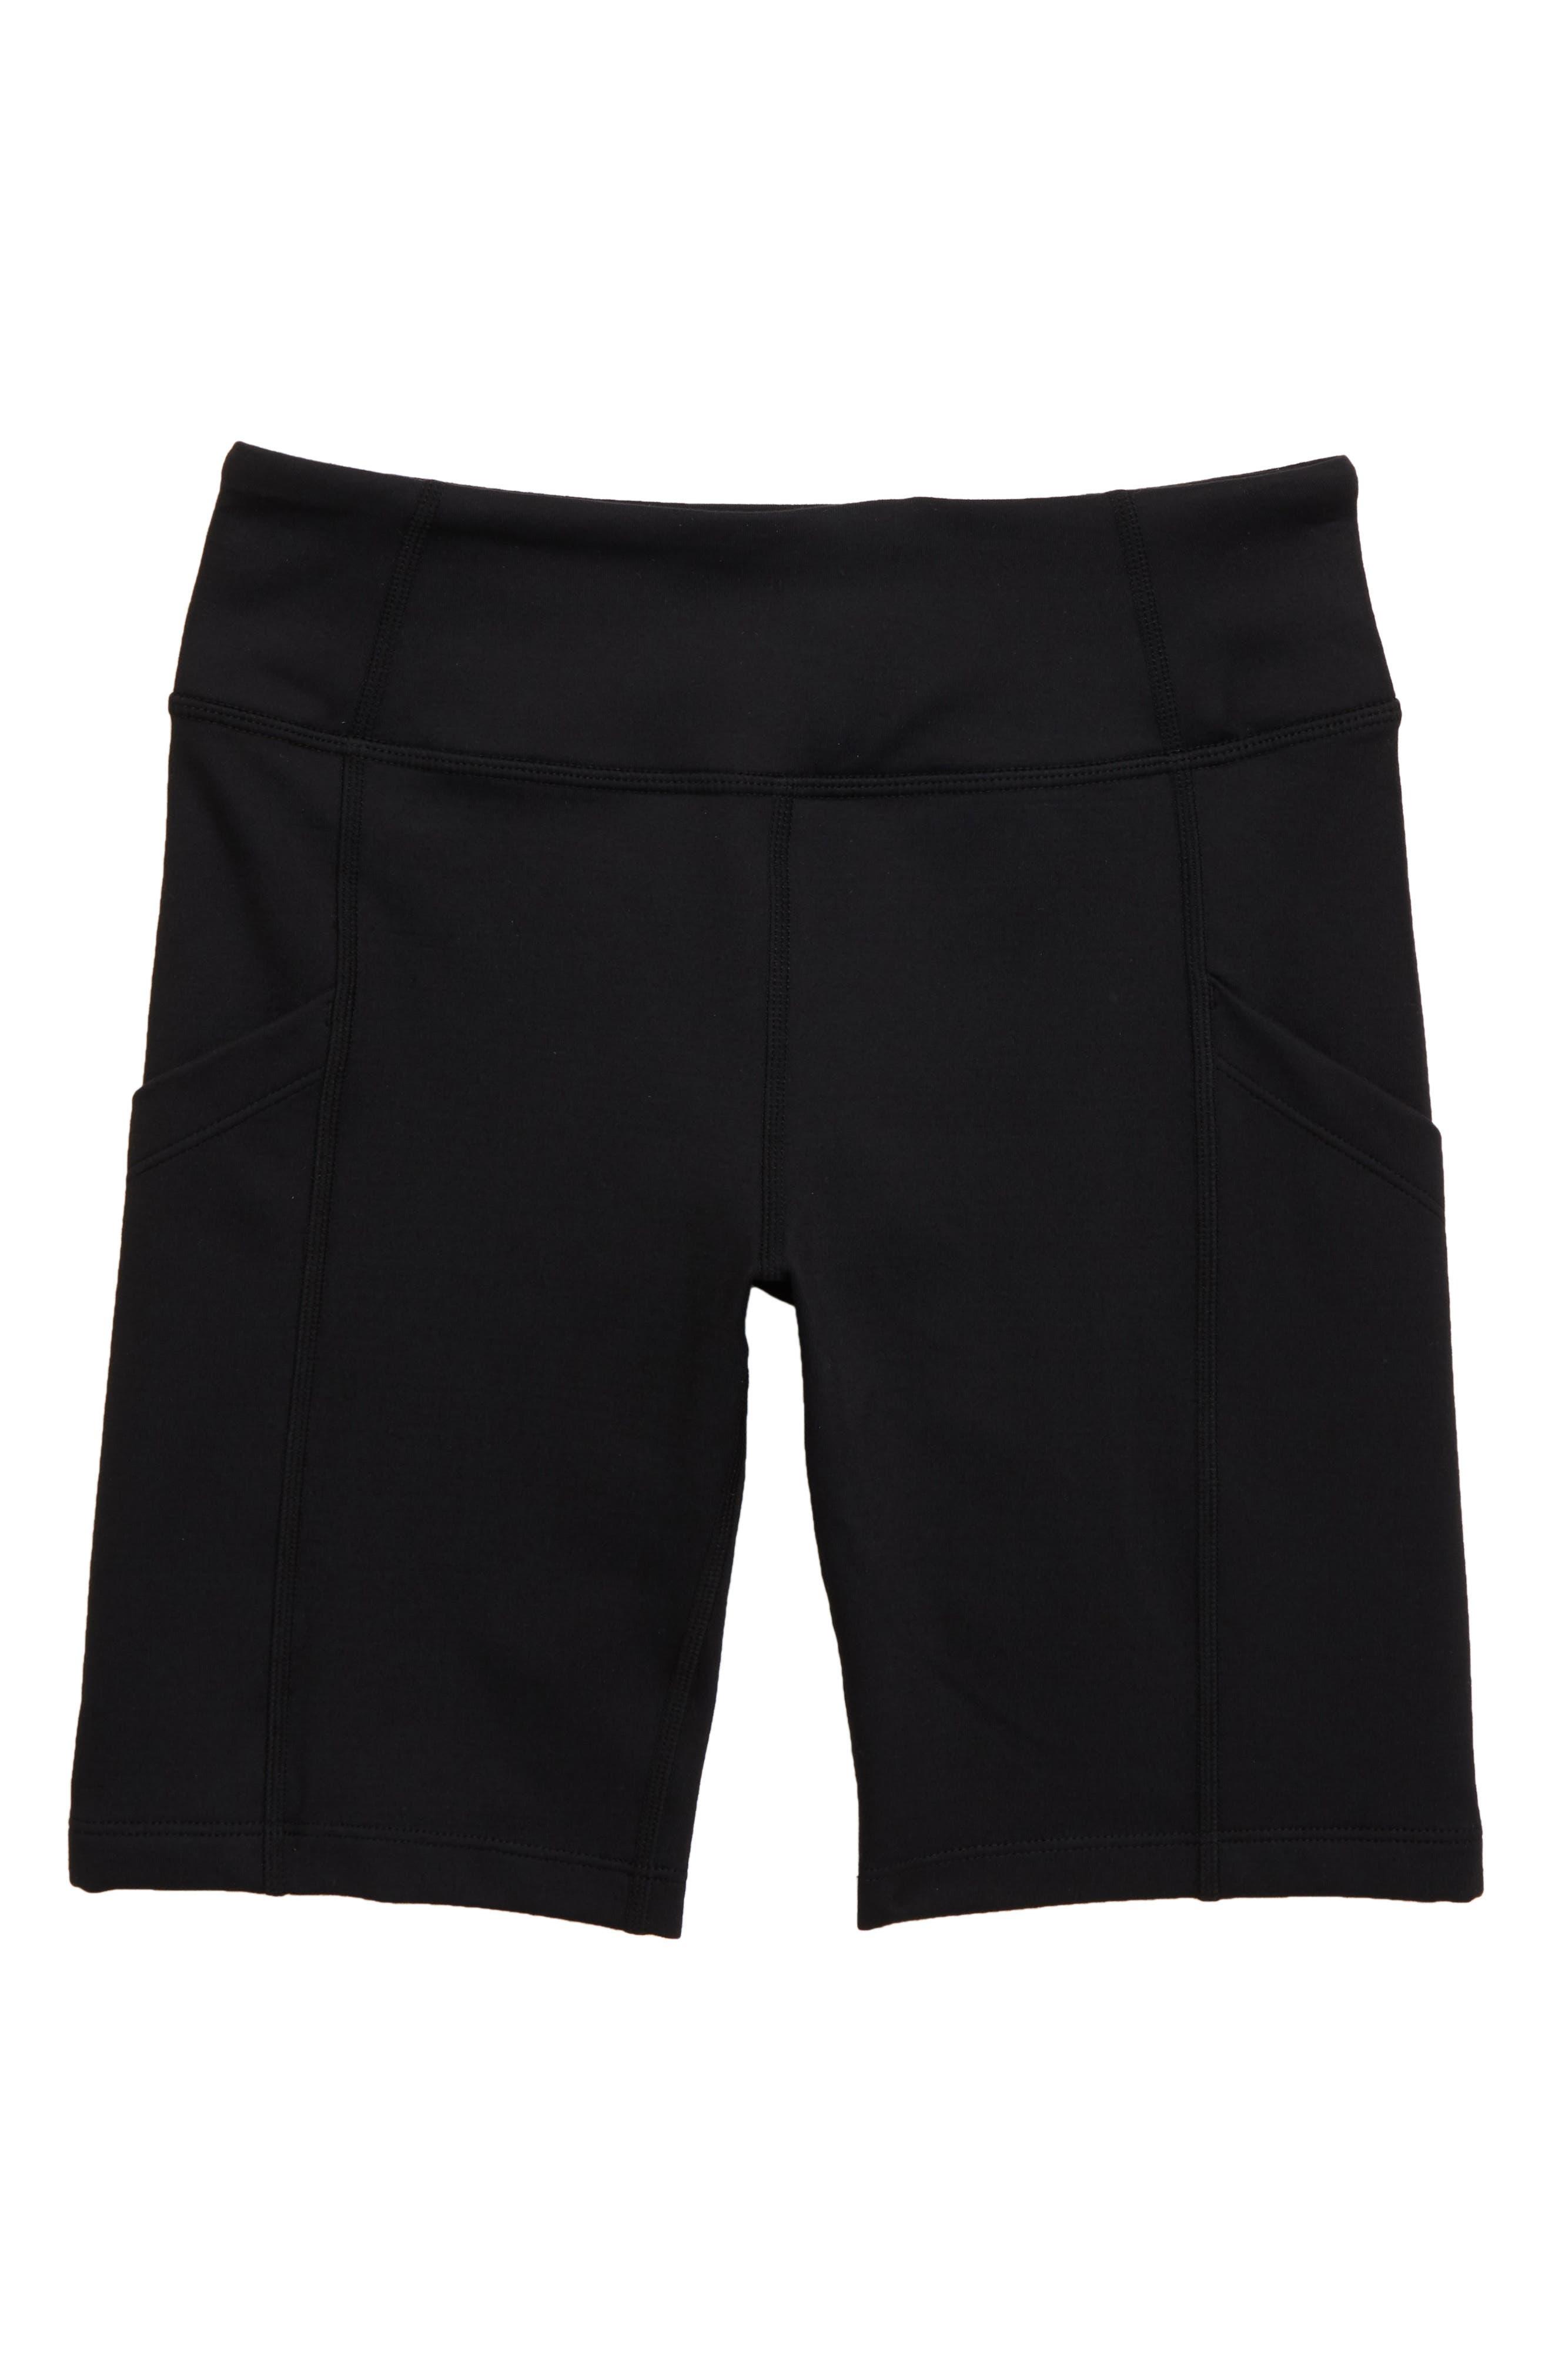 Girls Zella Girl Live In Bike Shorts